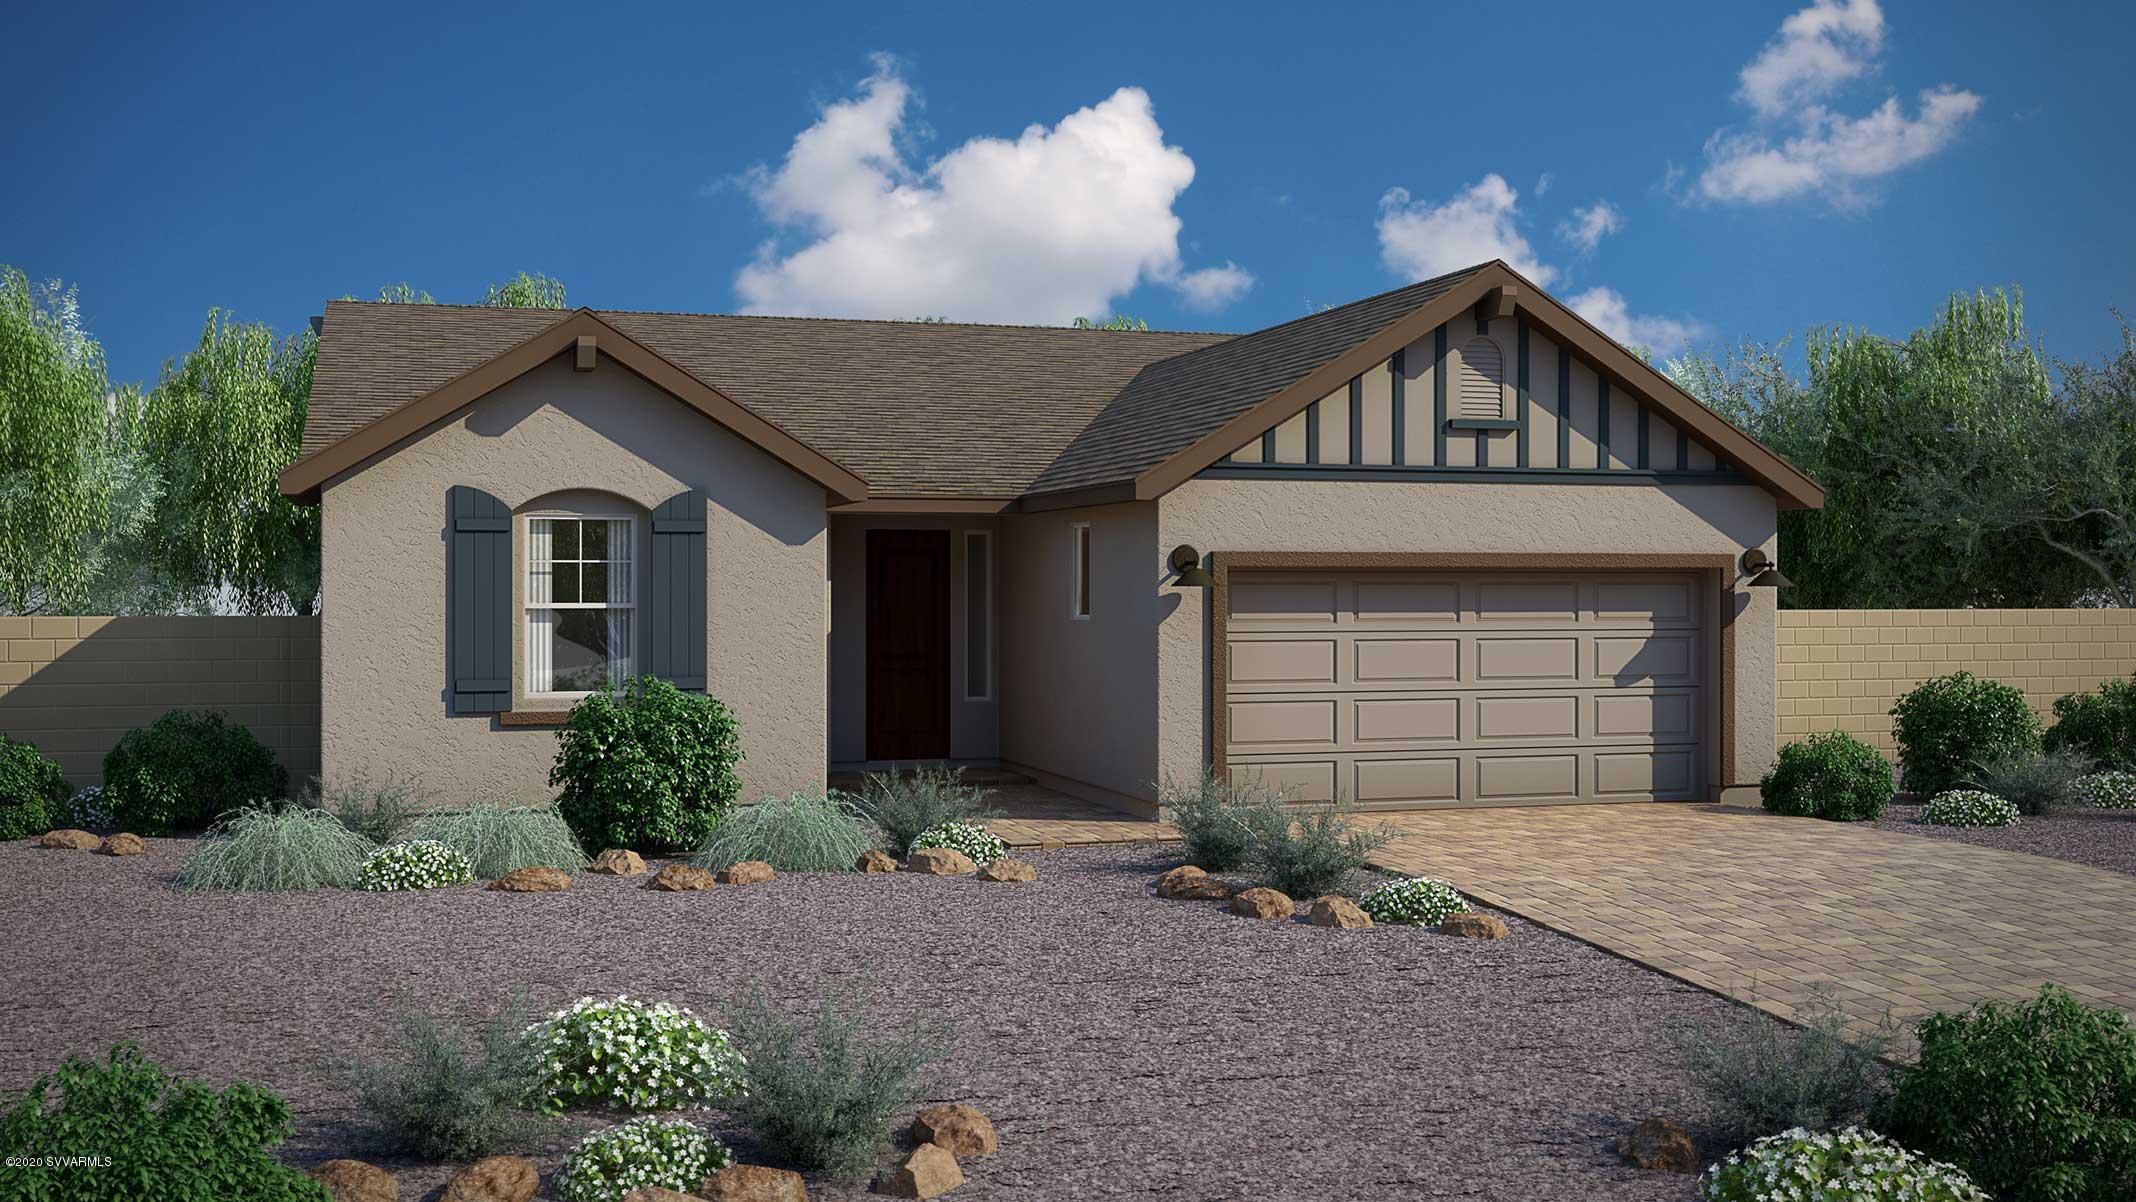 498 Miner's Gulch Drive Clarkdale, AZ 86324